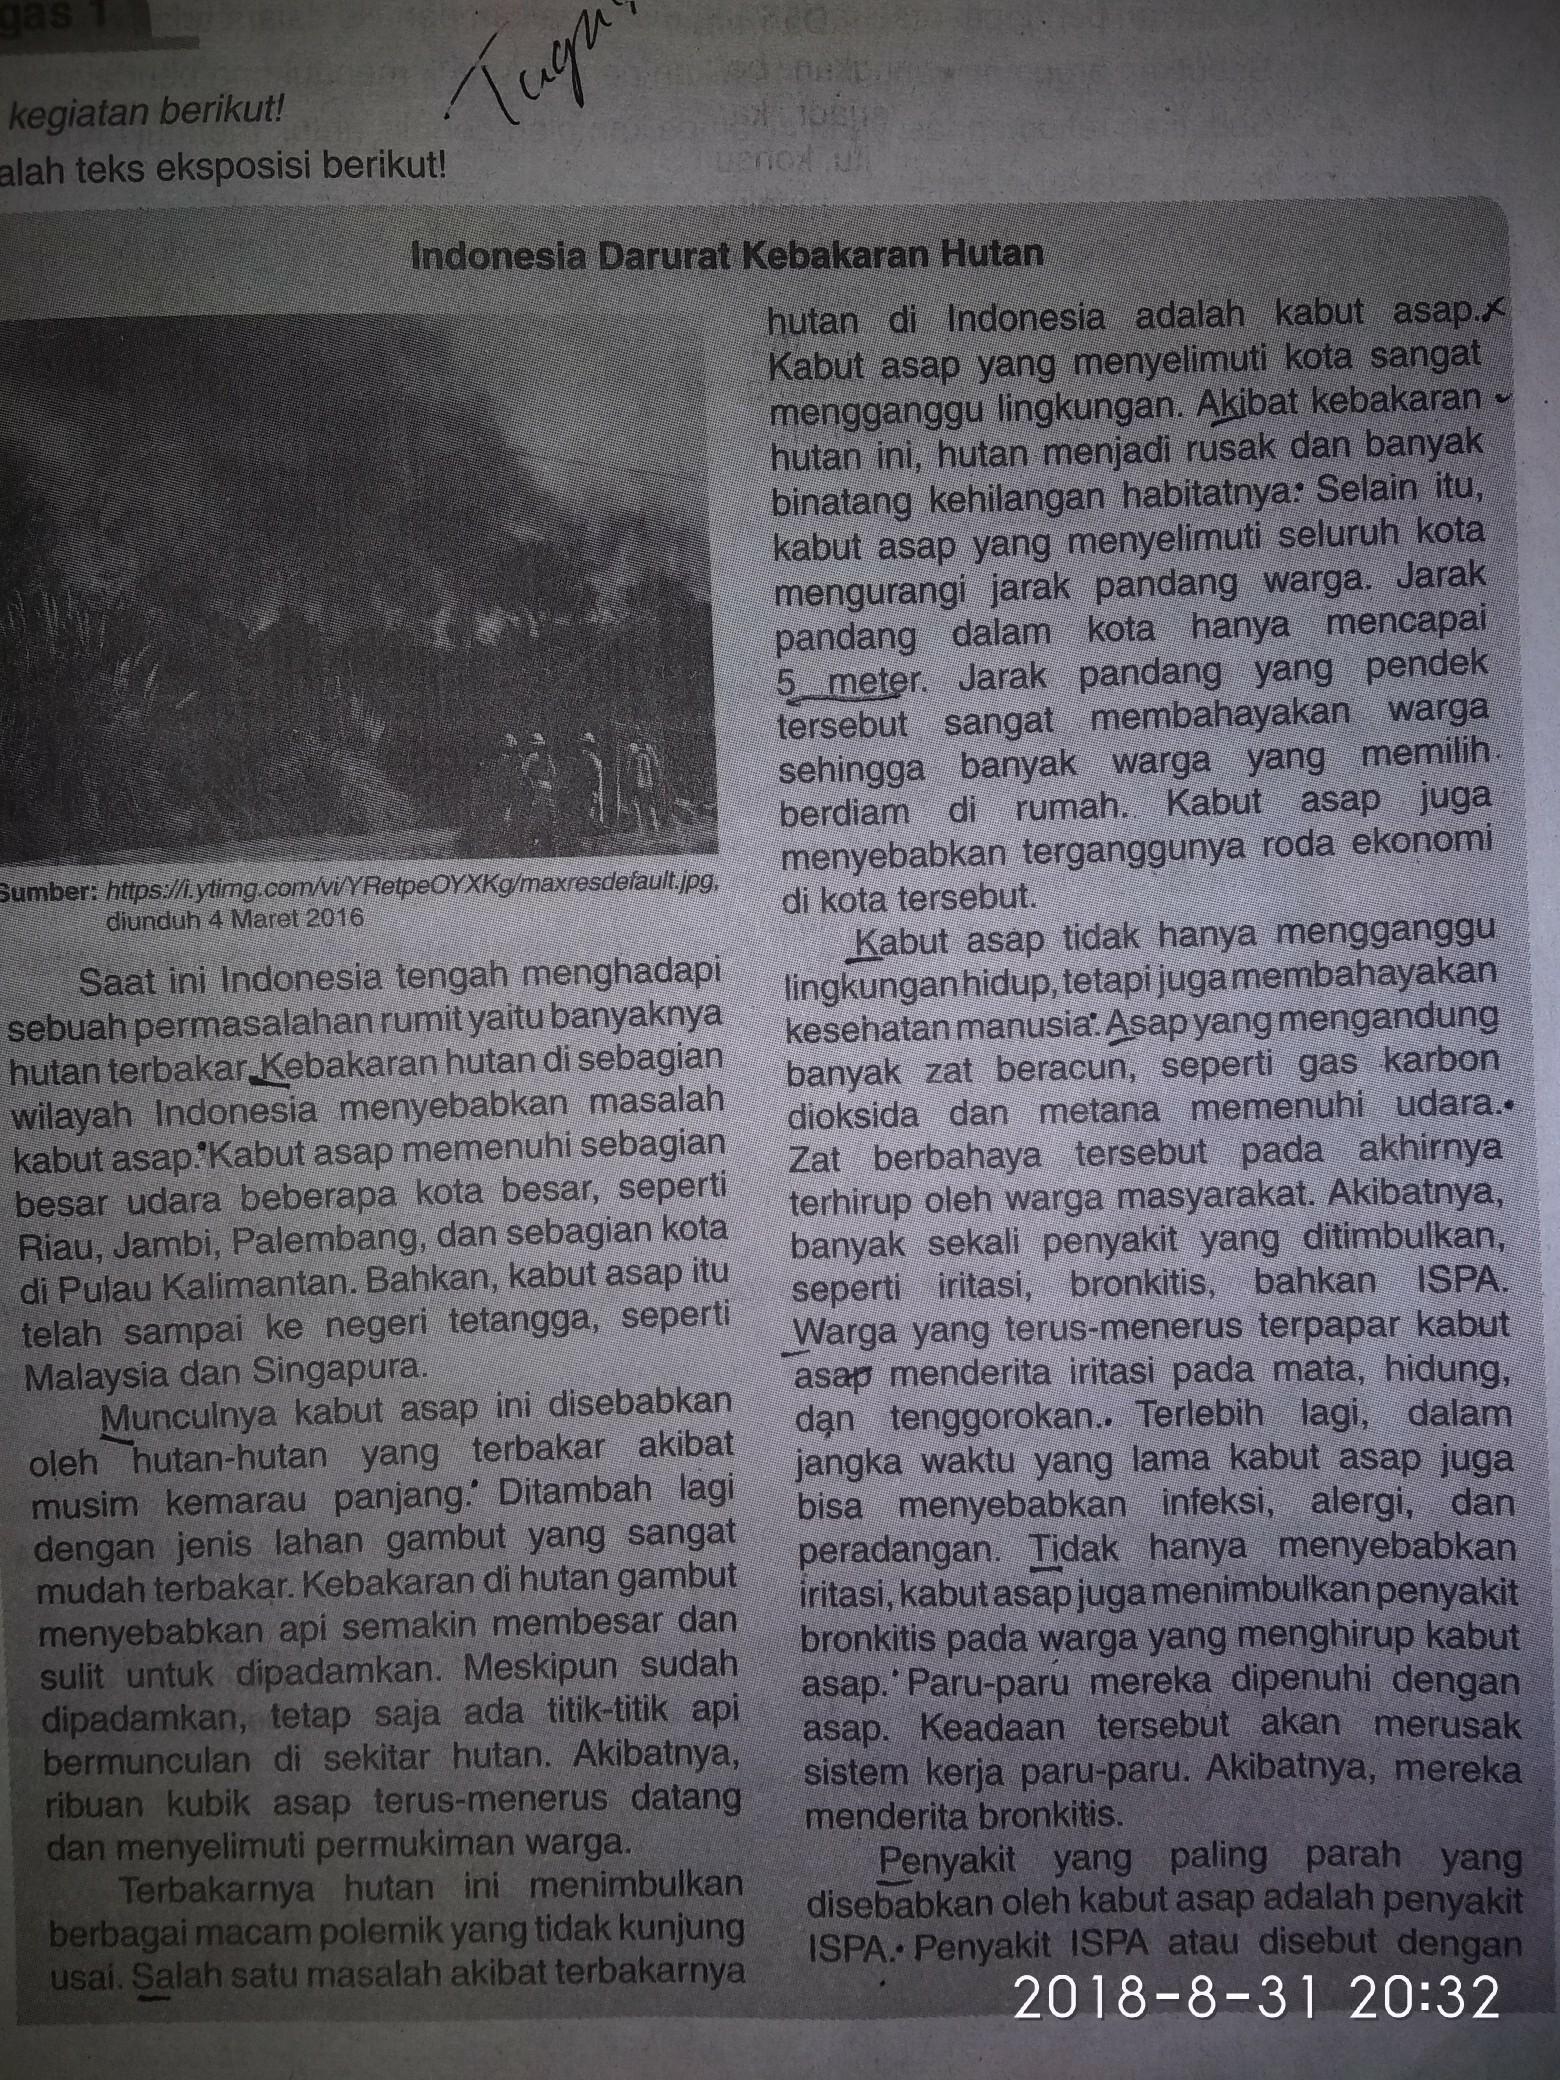 Fakta Teks Ekaposisi Indonesia Darurat Kebakaran Hutan Brainly Co Id